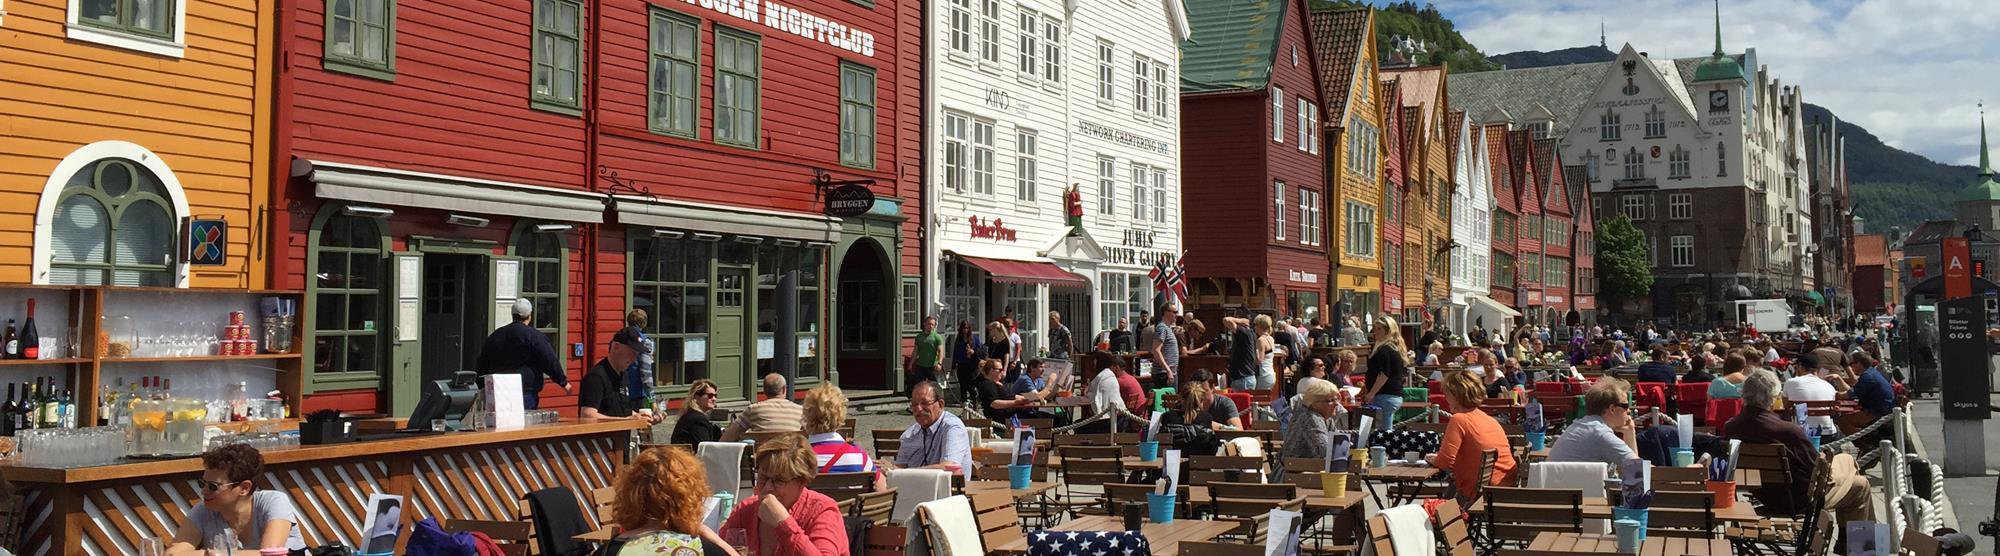 Bryggen - a World Heritage Site